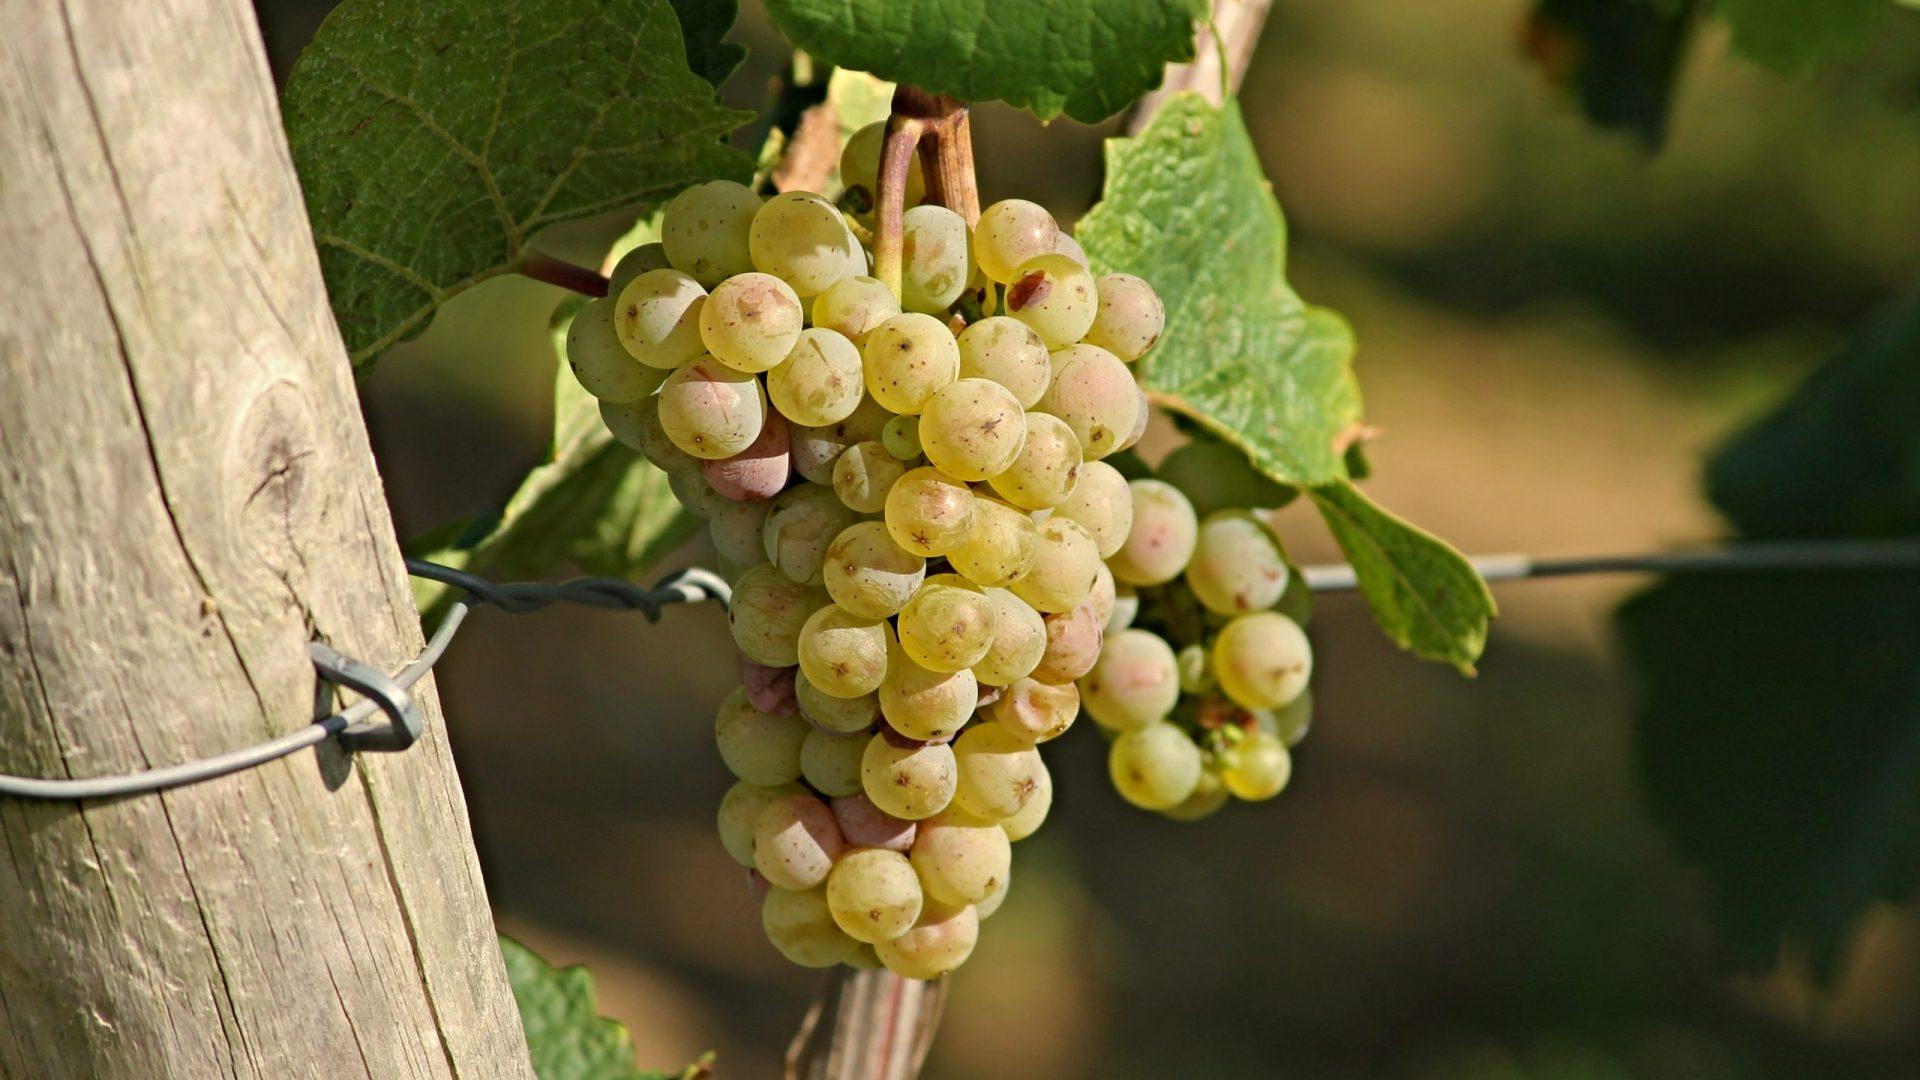 grape-2763256